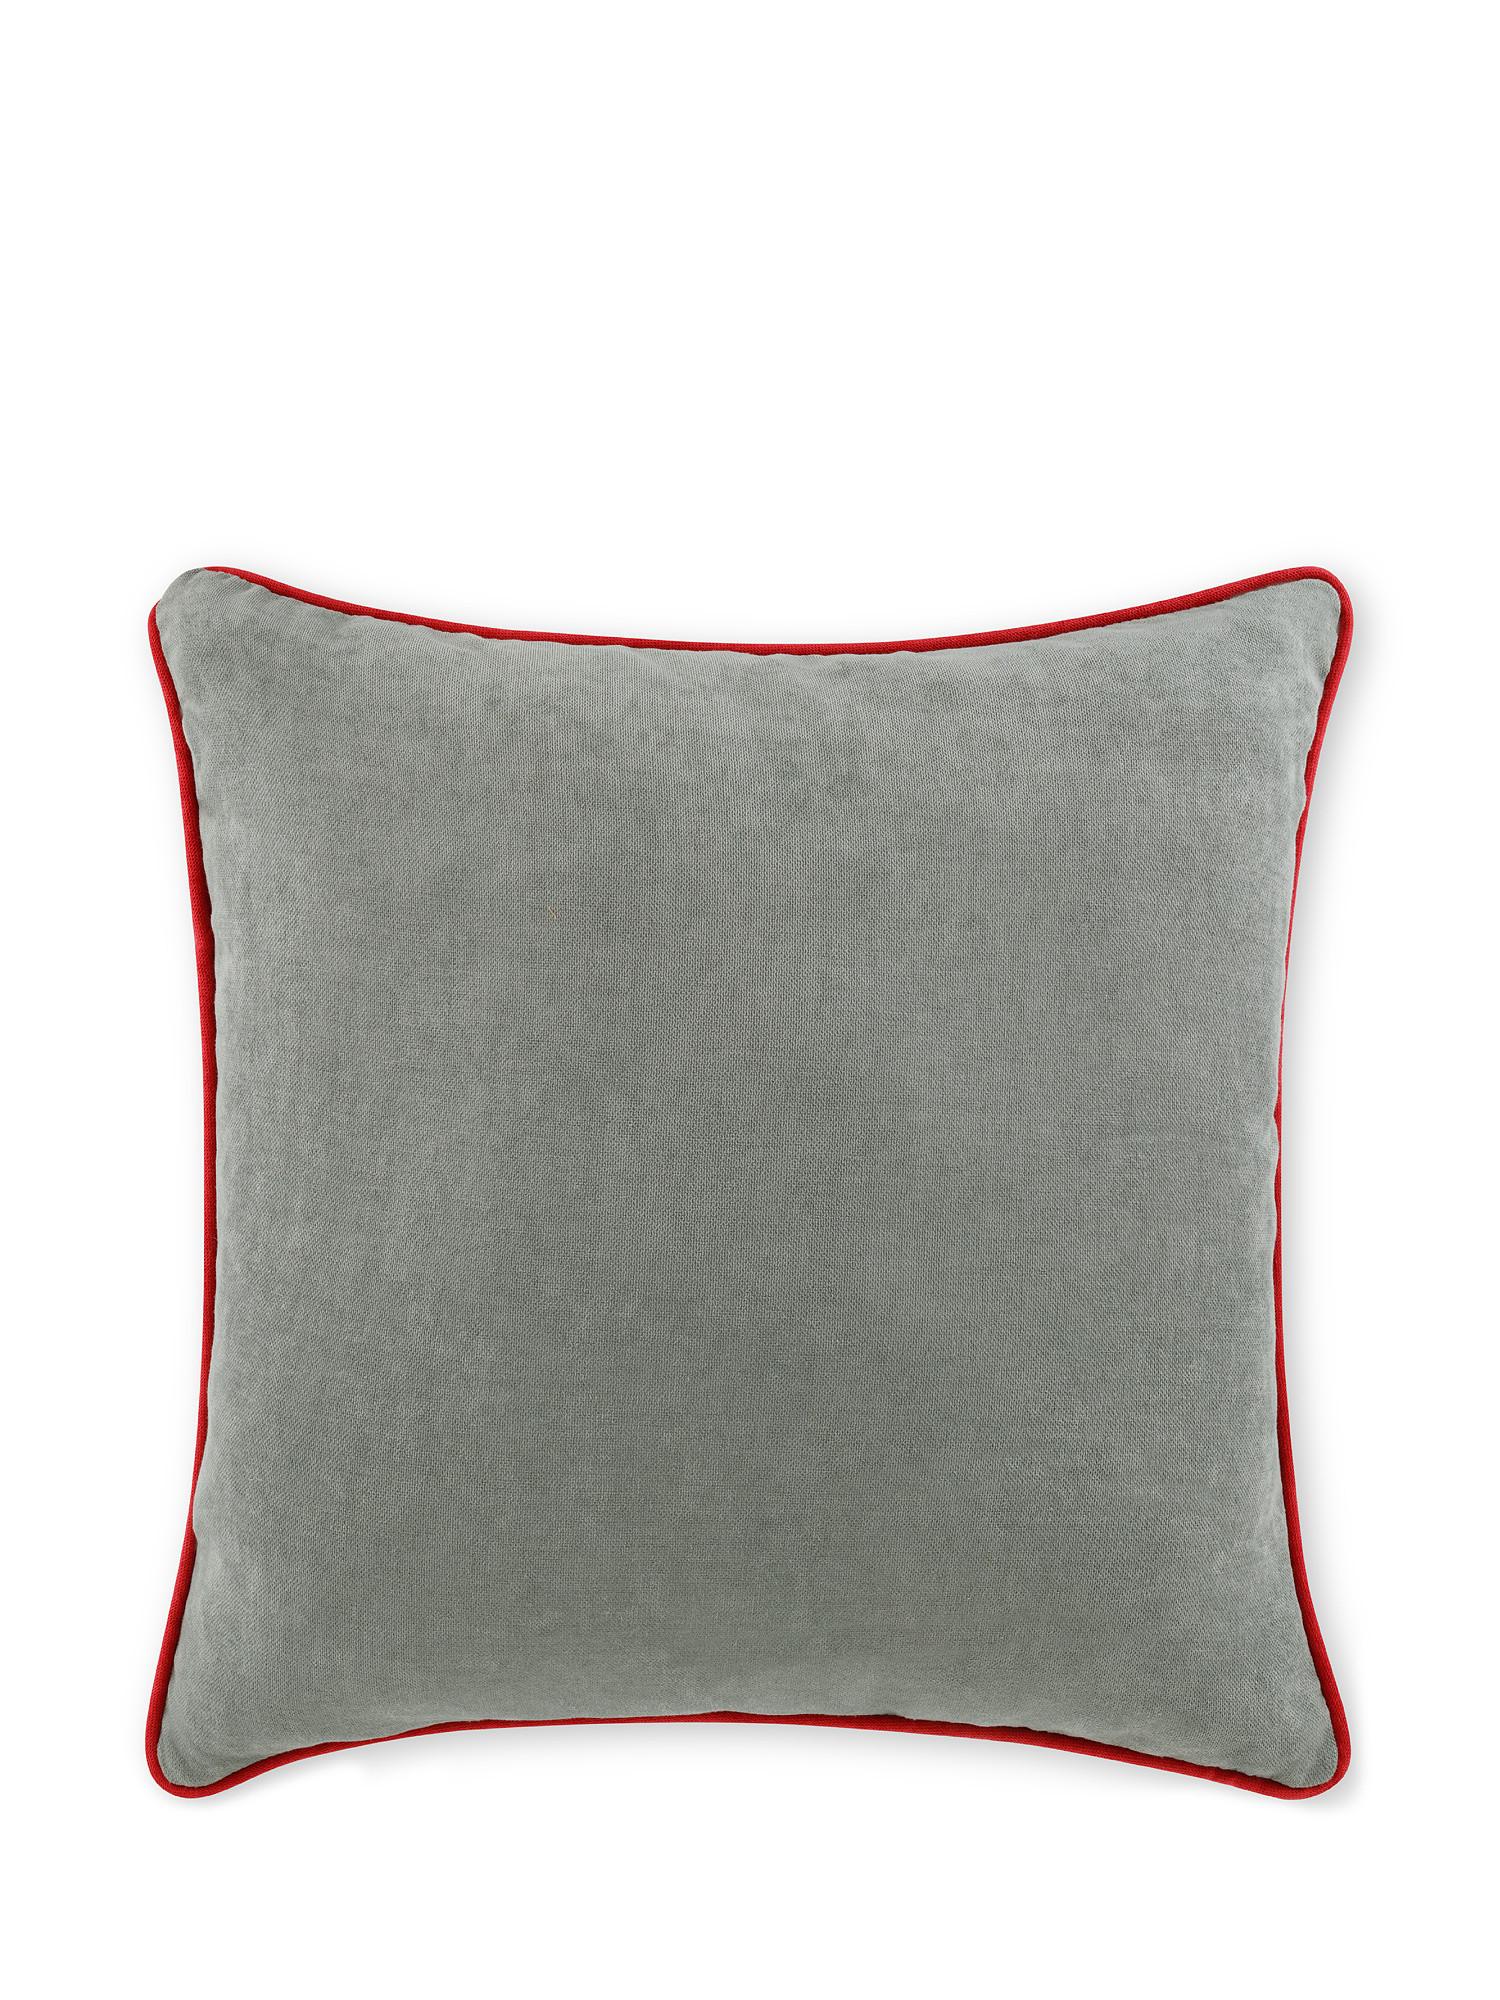 Cuscino tessuto effetto mélange 50x50cm, Grigio, large image number 0